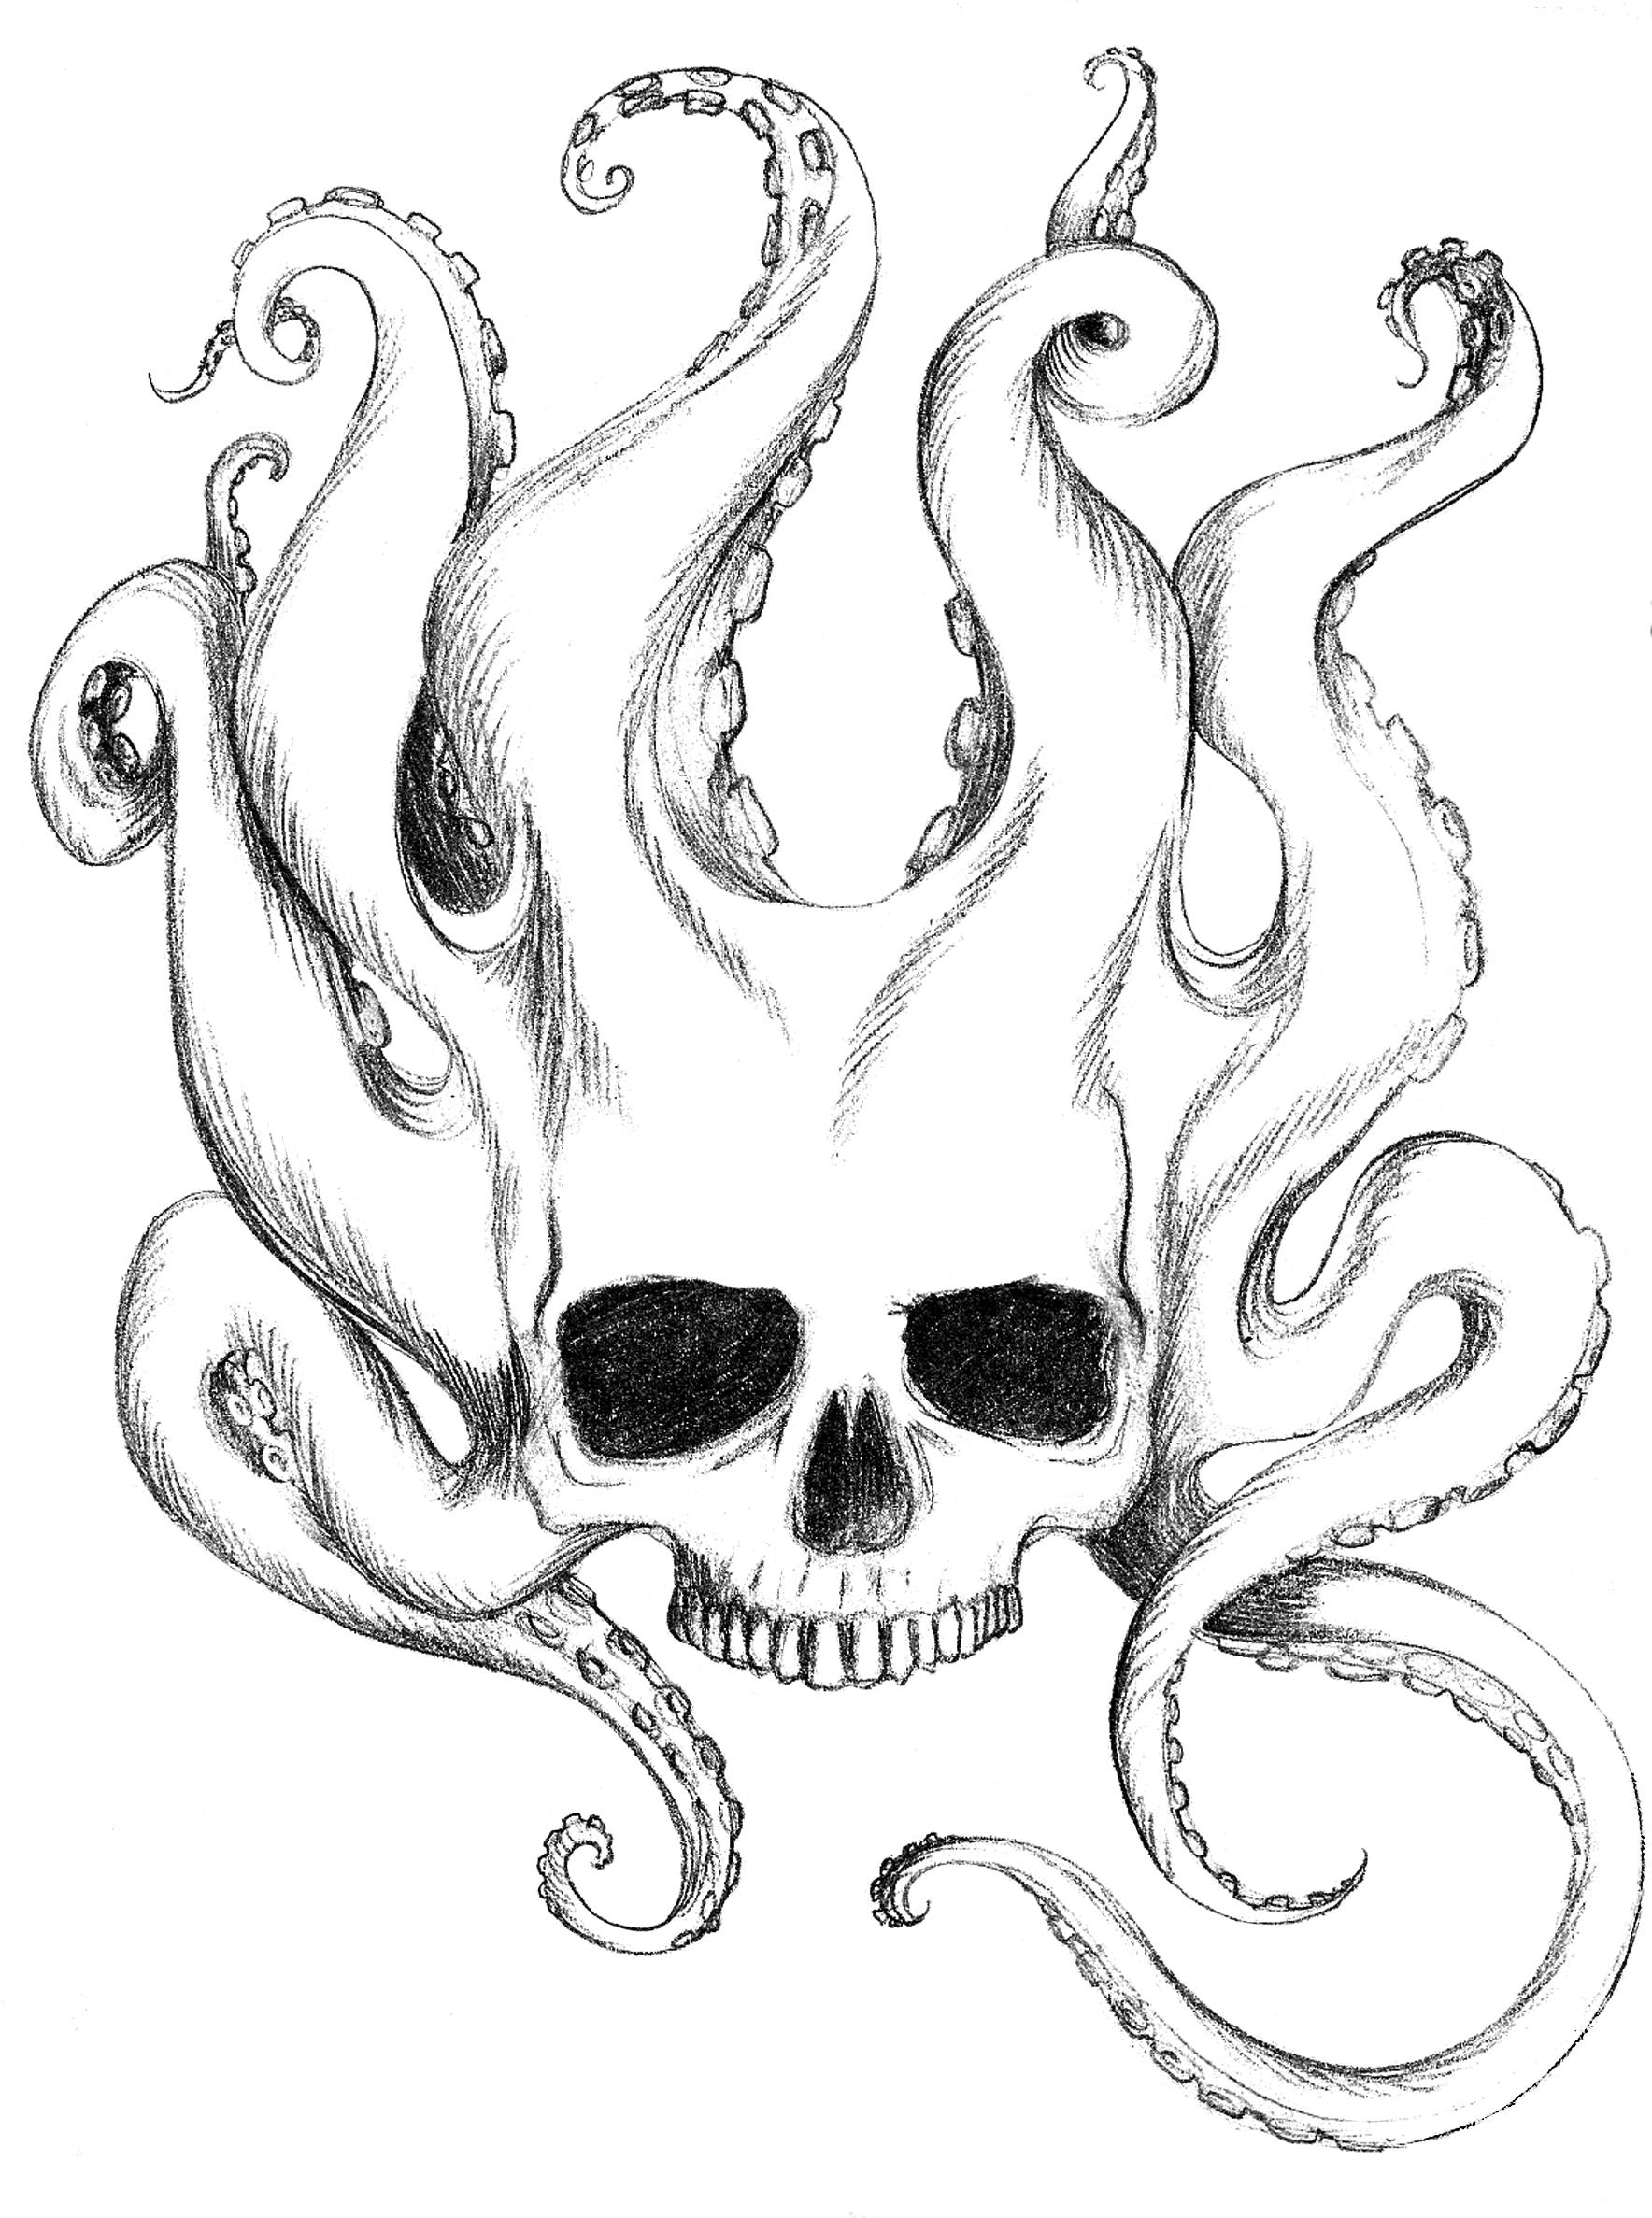 Skullopus